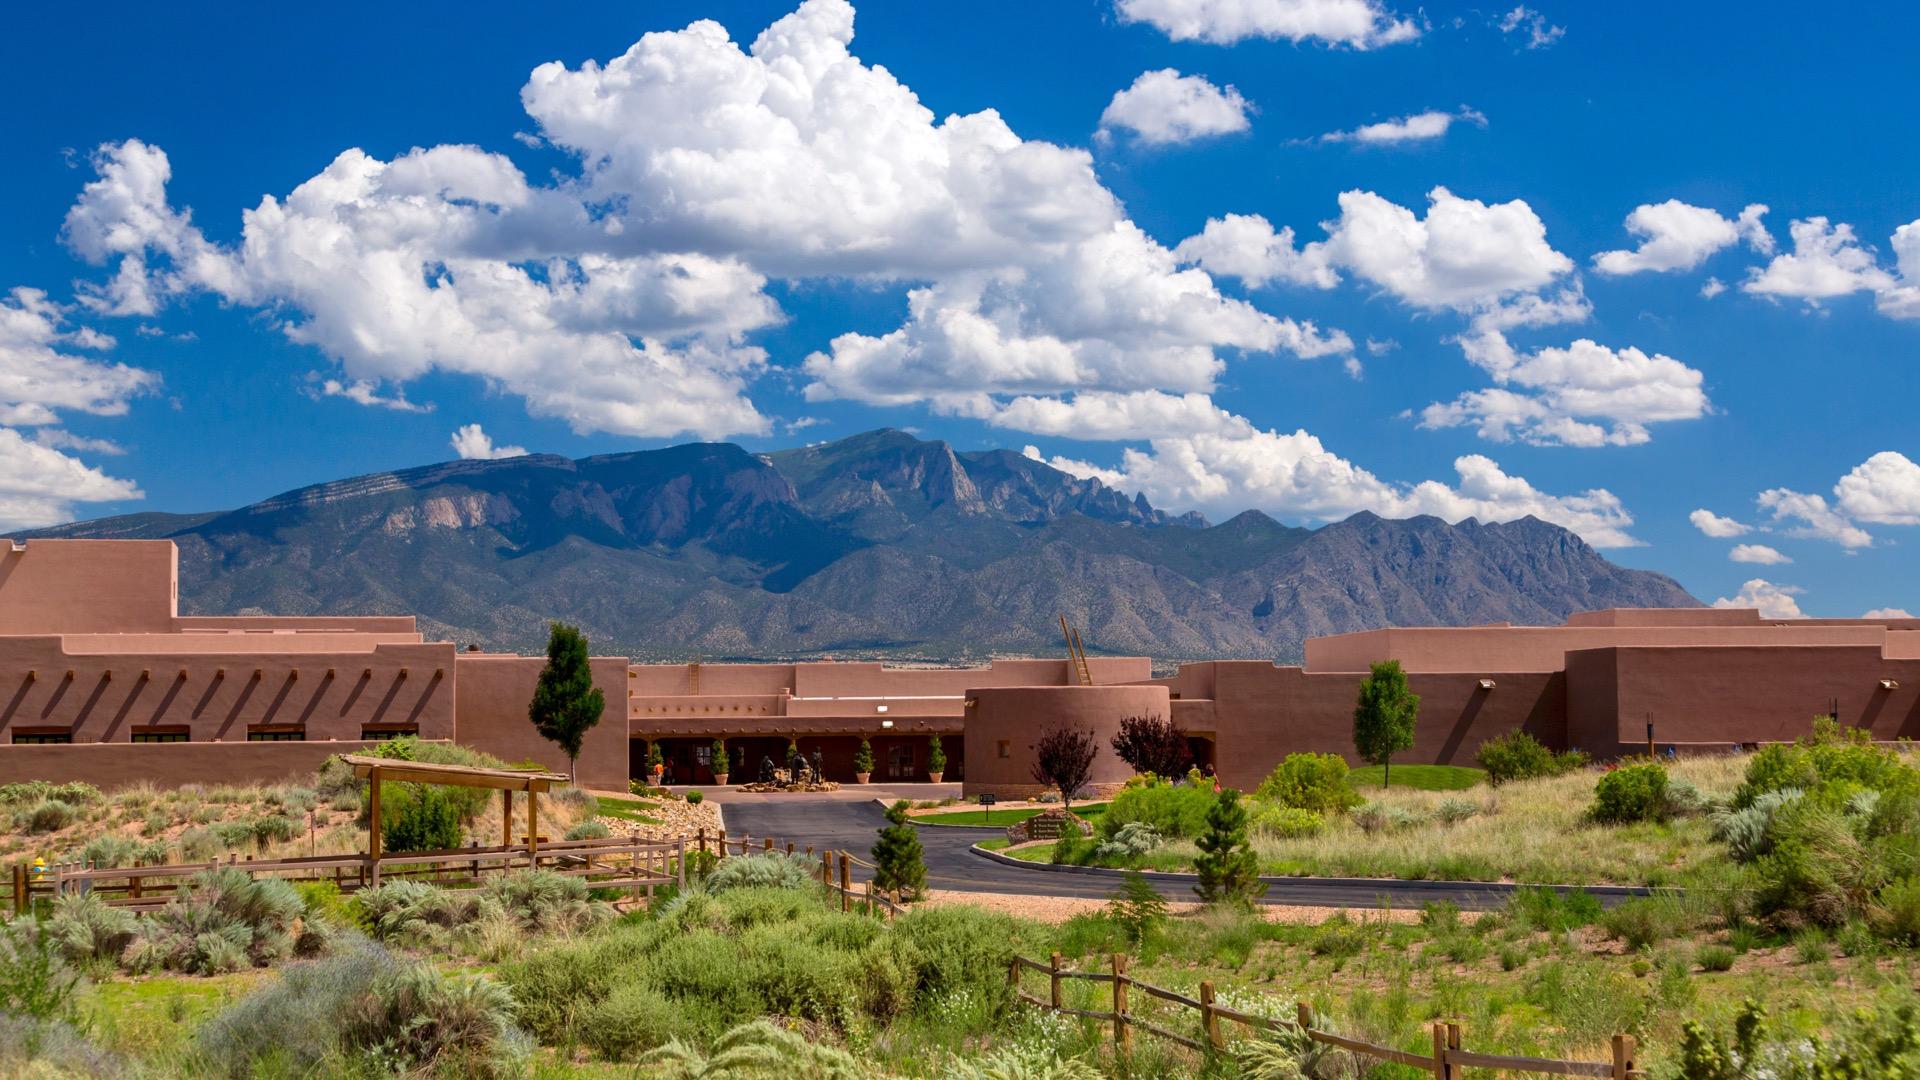 Resort And Spa Albuquerque New Mexico